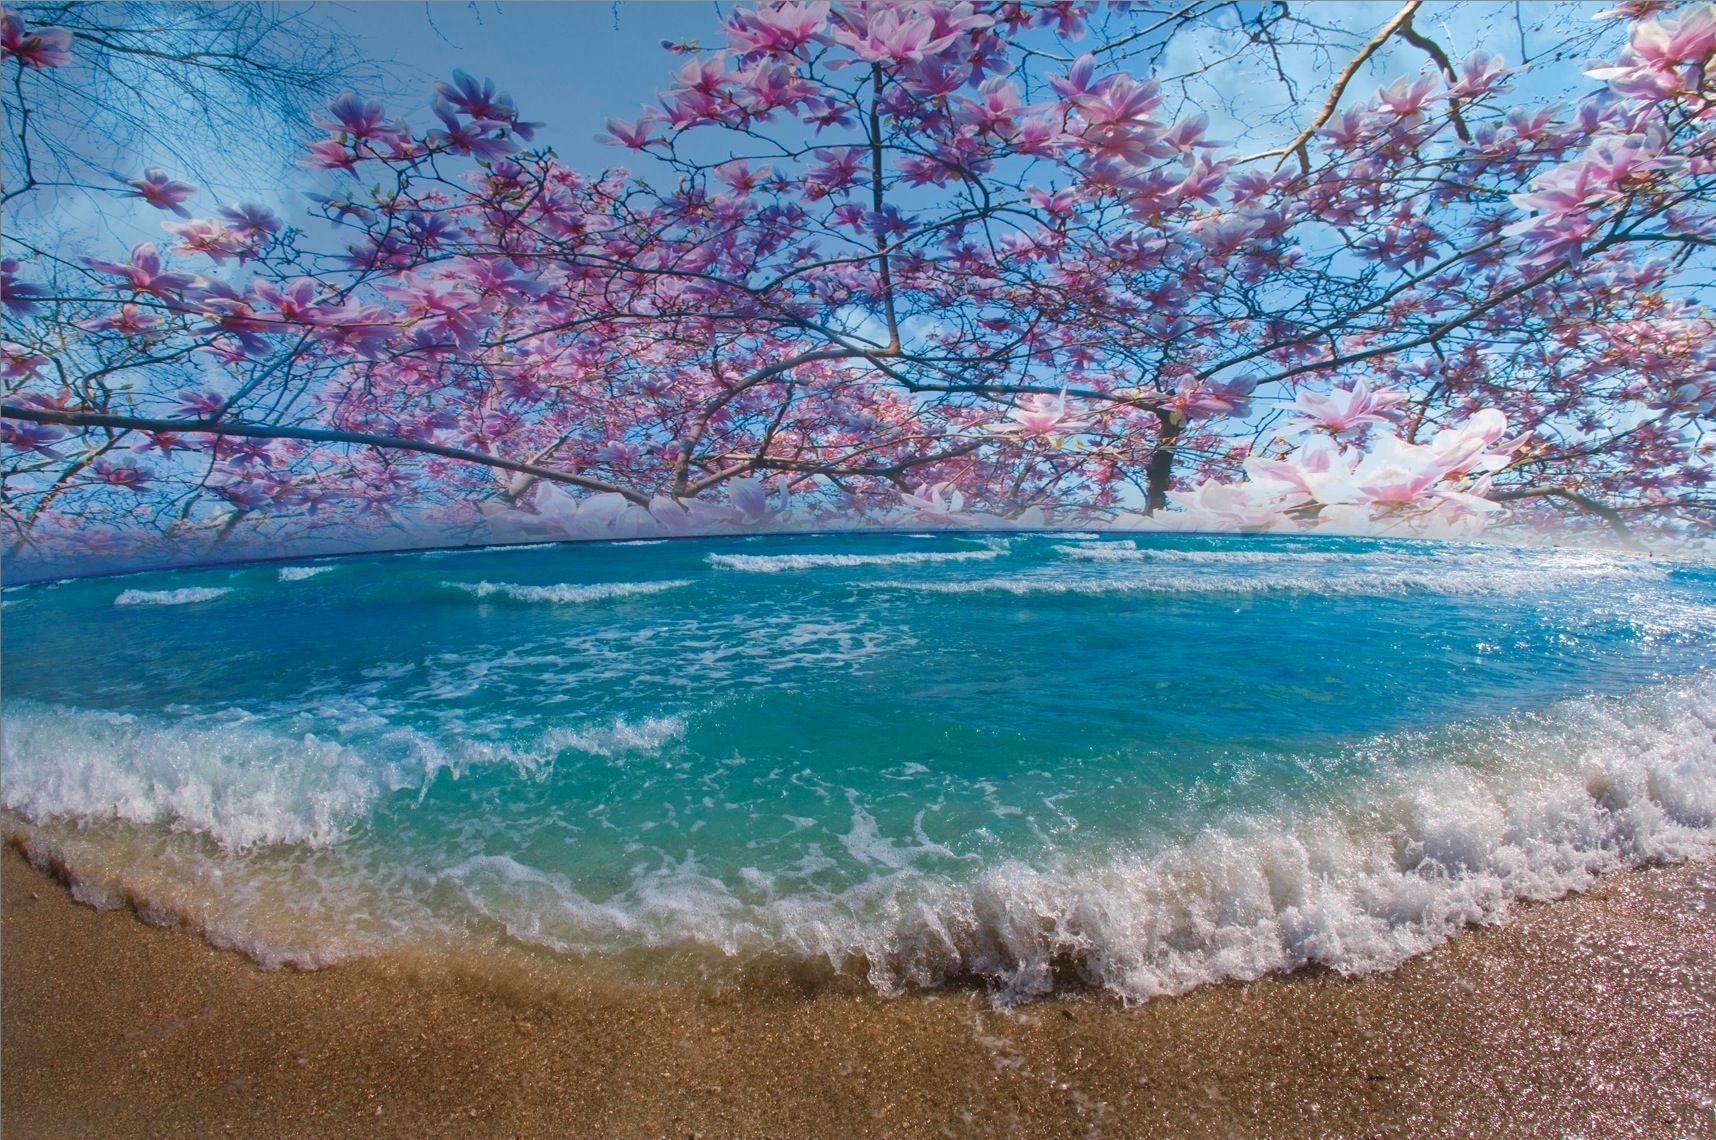 Caribbean in Bloom